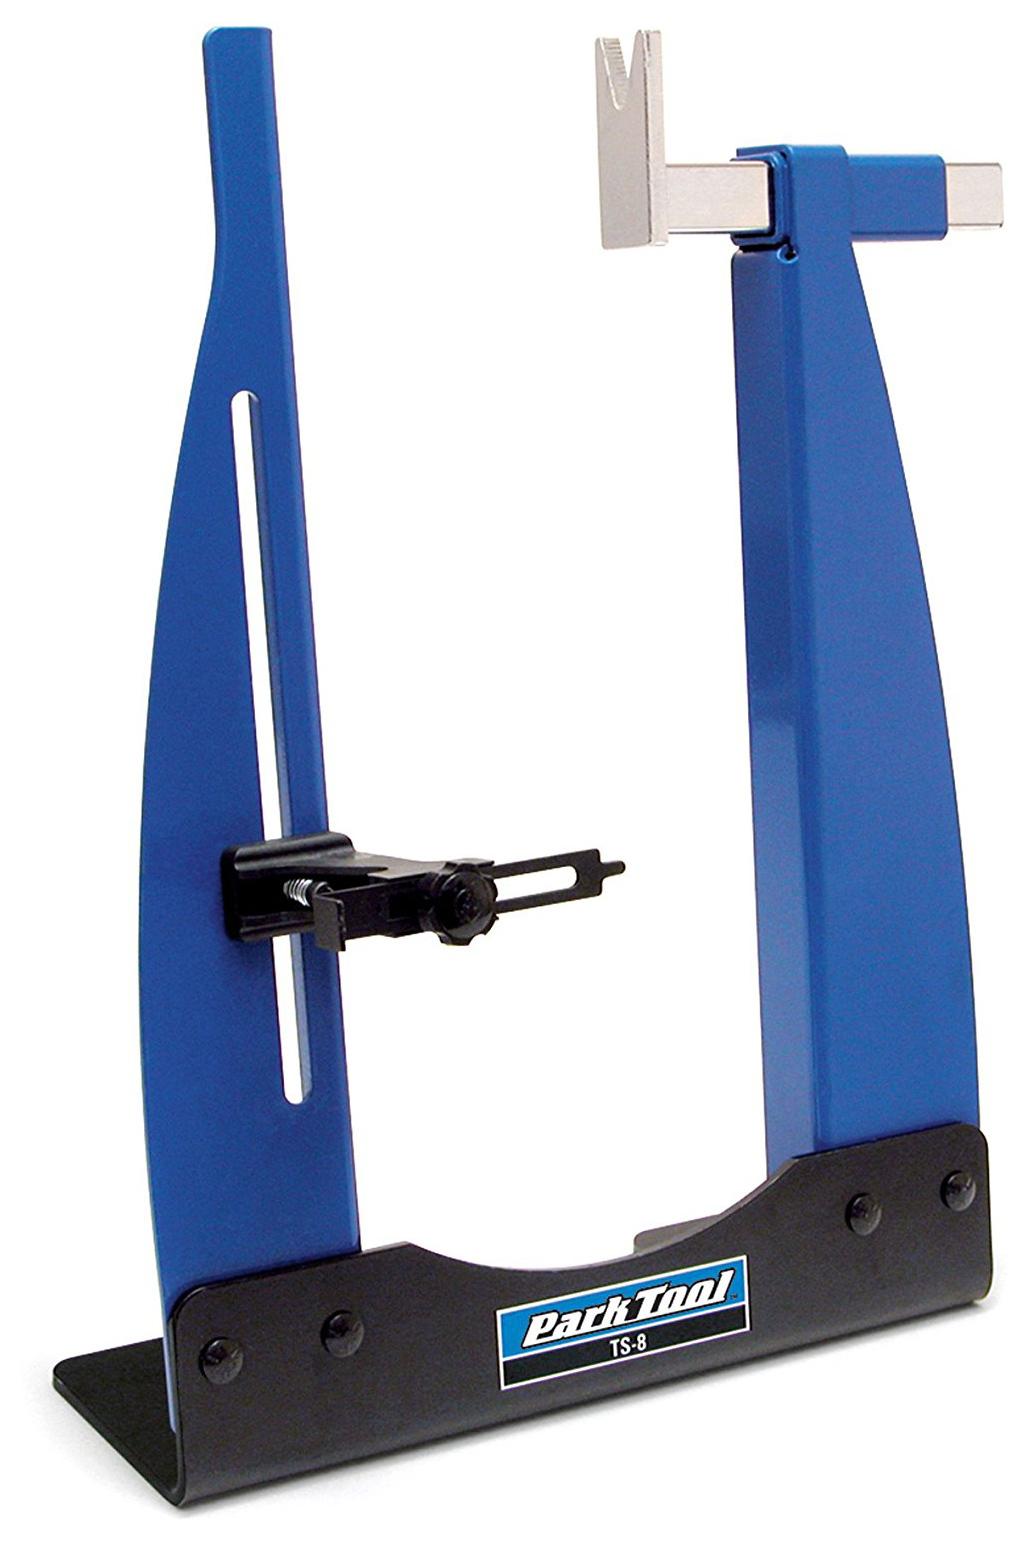 Аксессуар Parktool станок для правки колес (PTLTS-8)